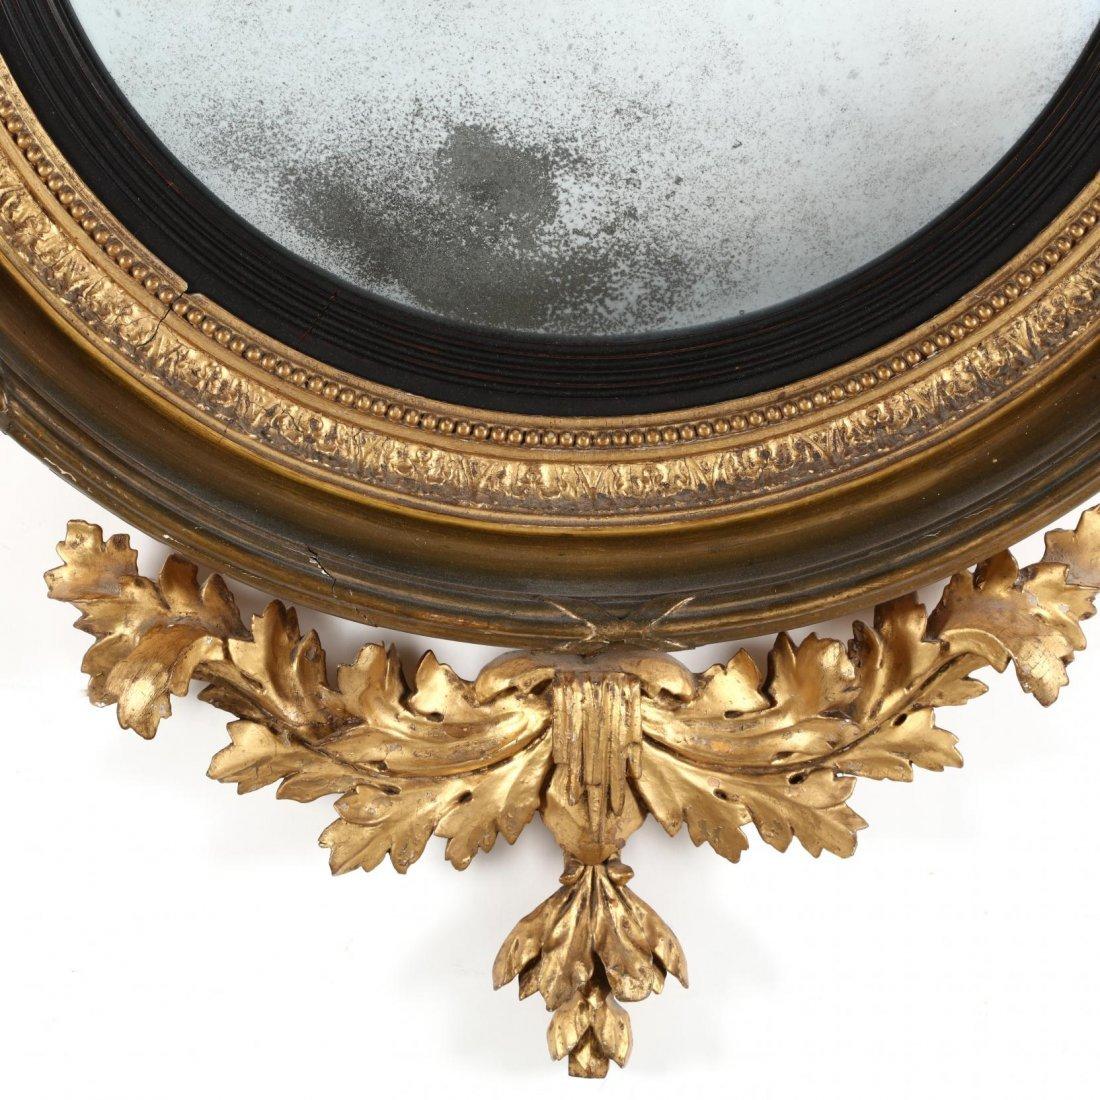 A Regency Carved and Gilded Bullseye Mirror - 2